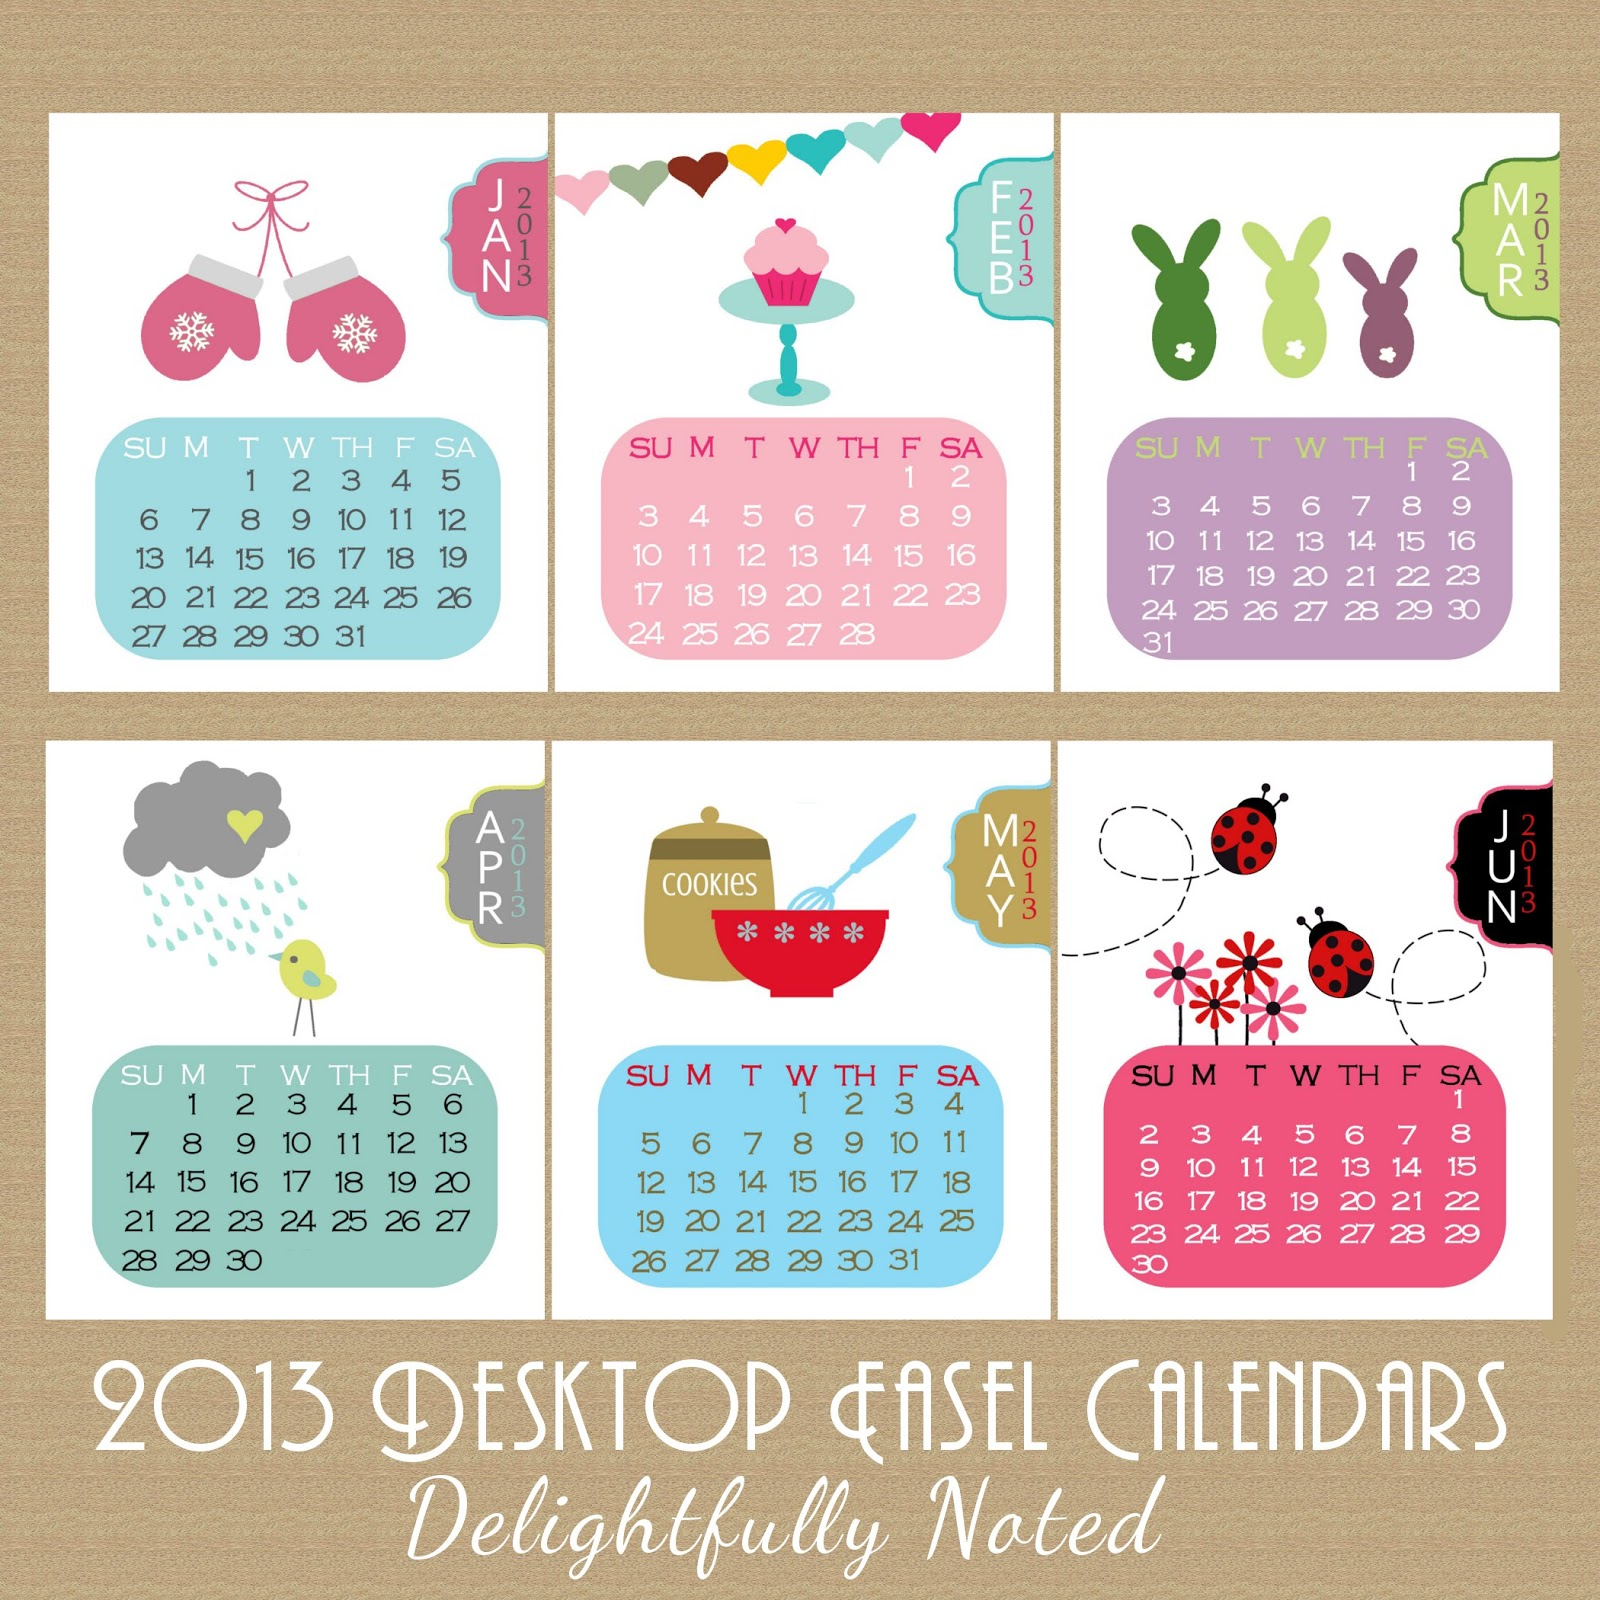 Creative Table Calendar Ideas : They re here the delightfully noted desk calendar